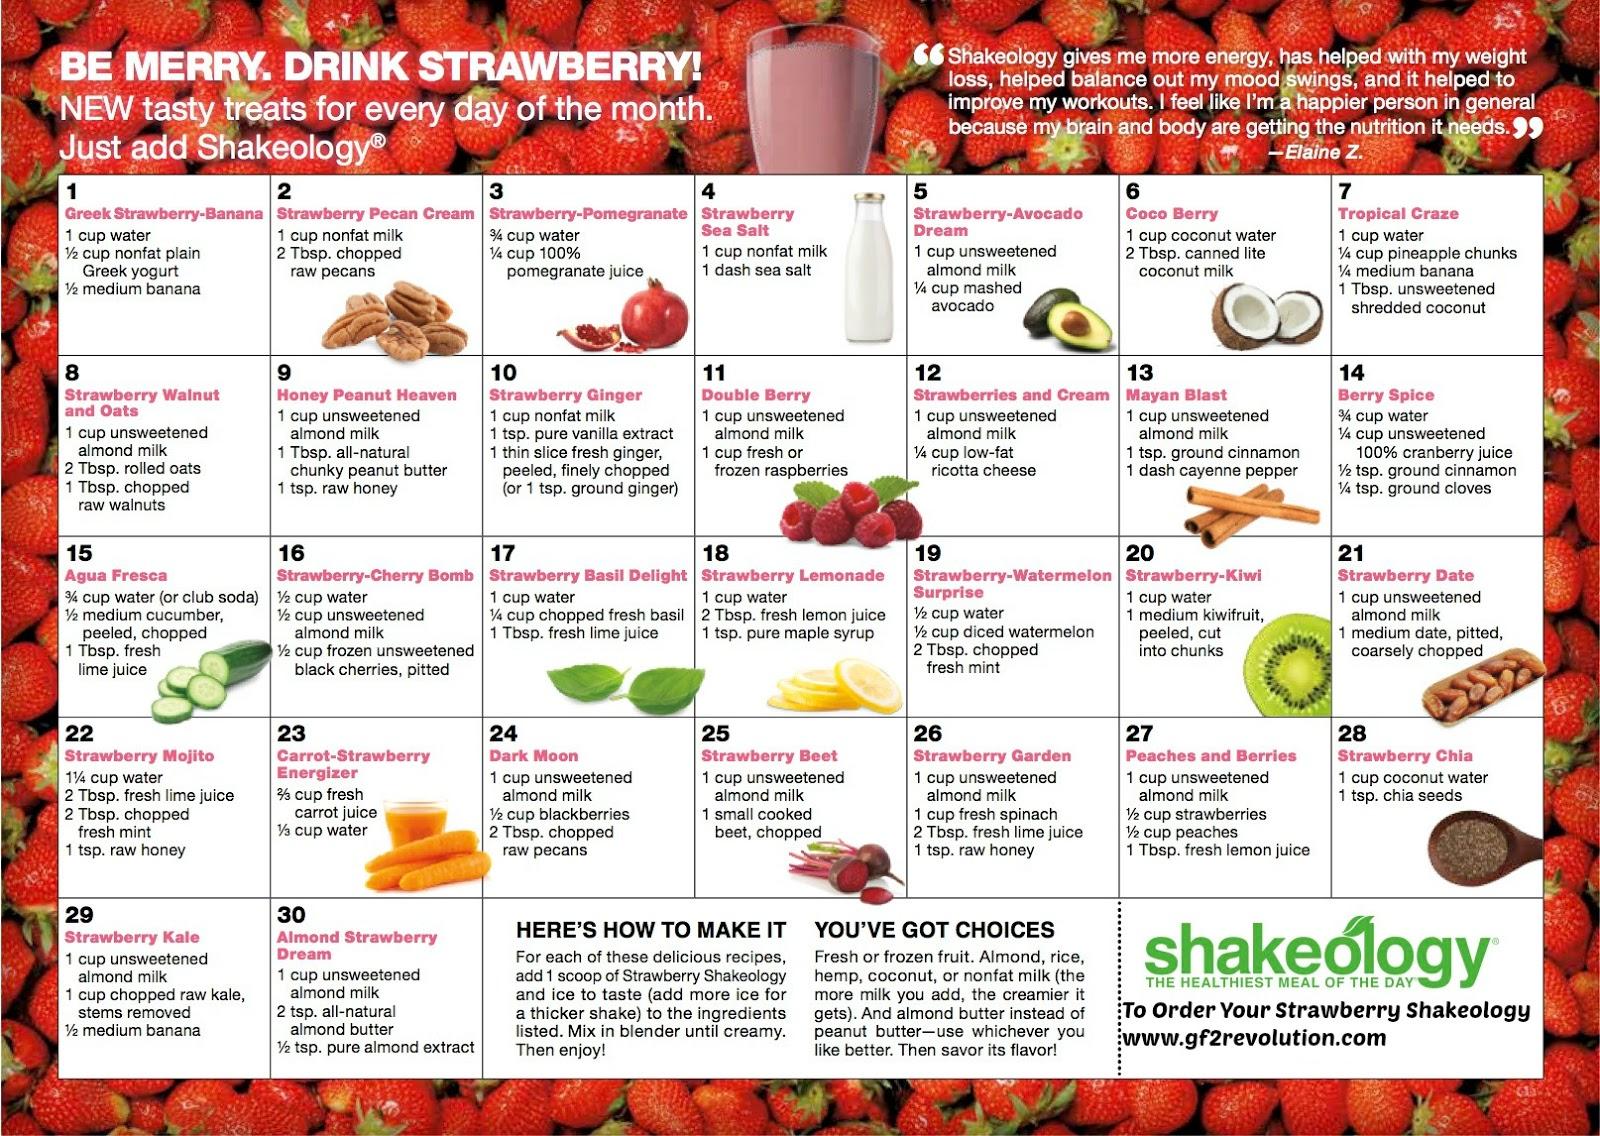 strawberry shakeology flavor ideas